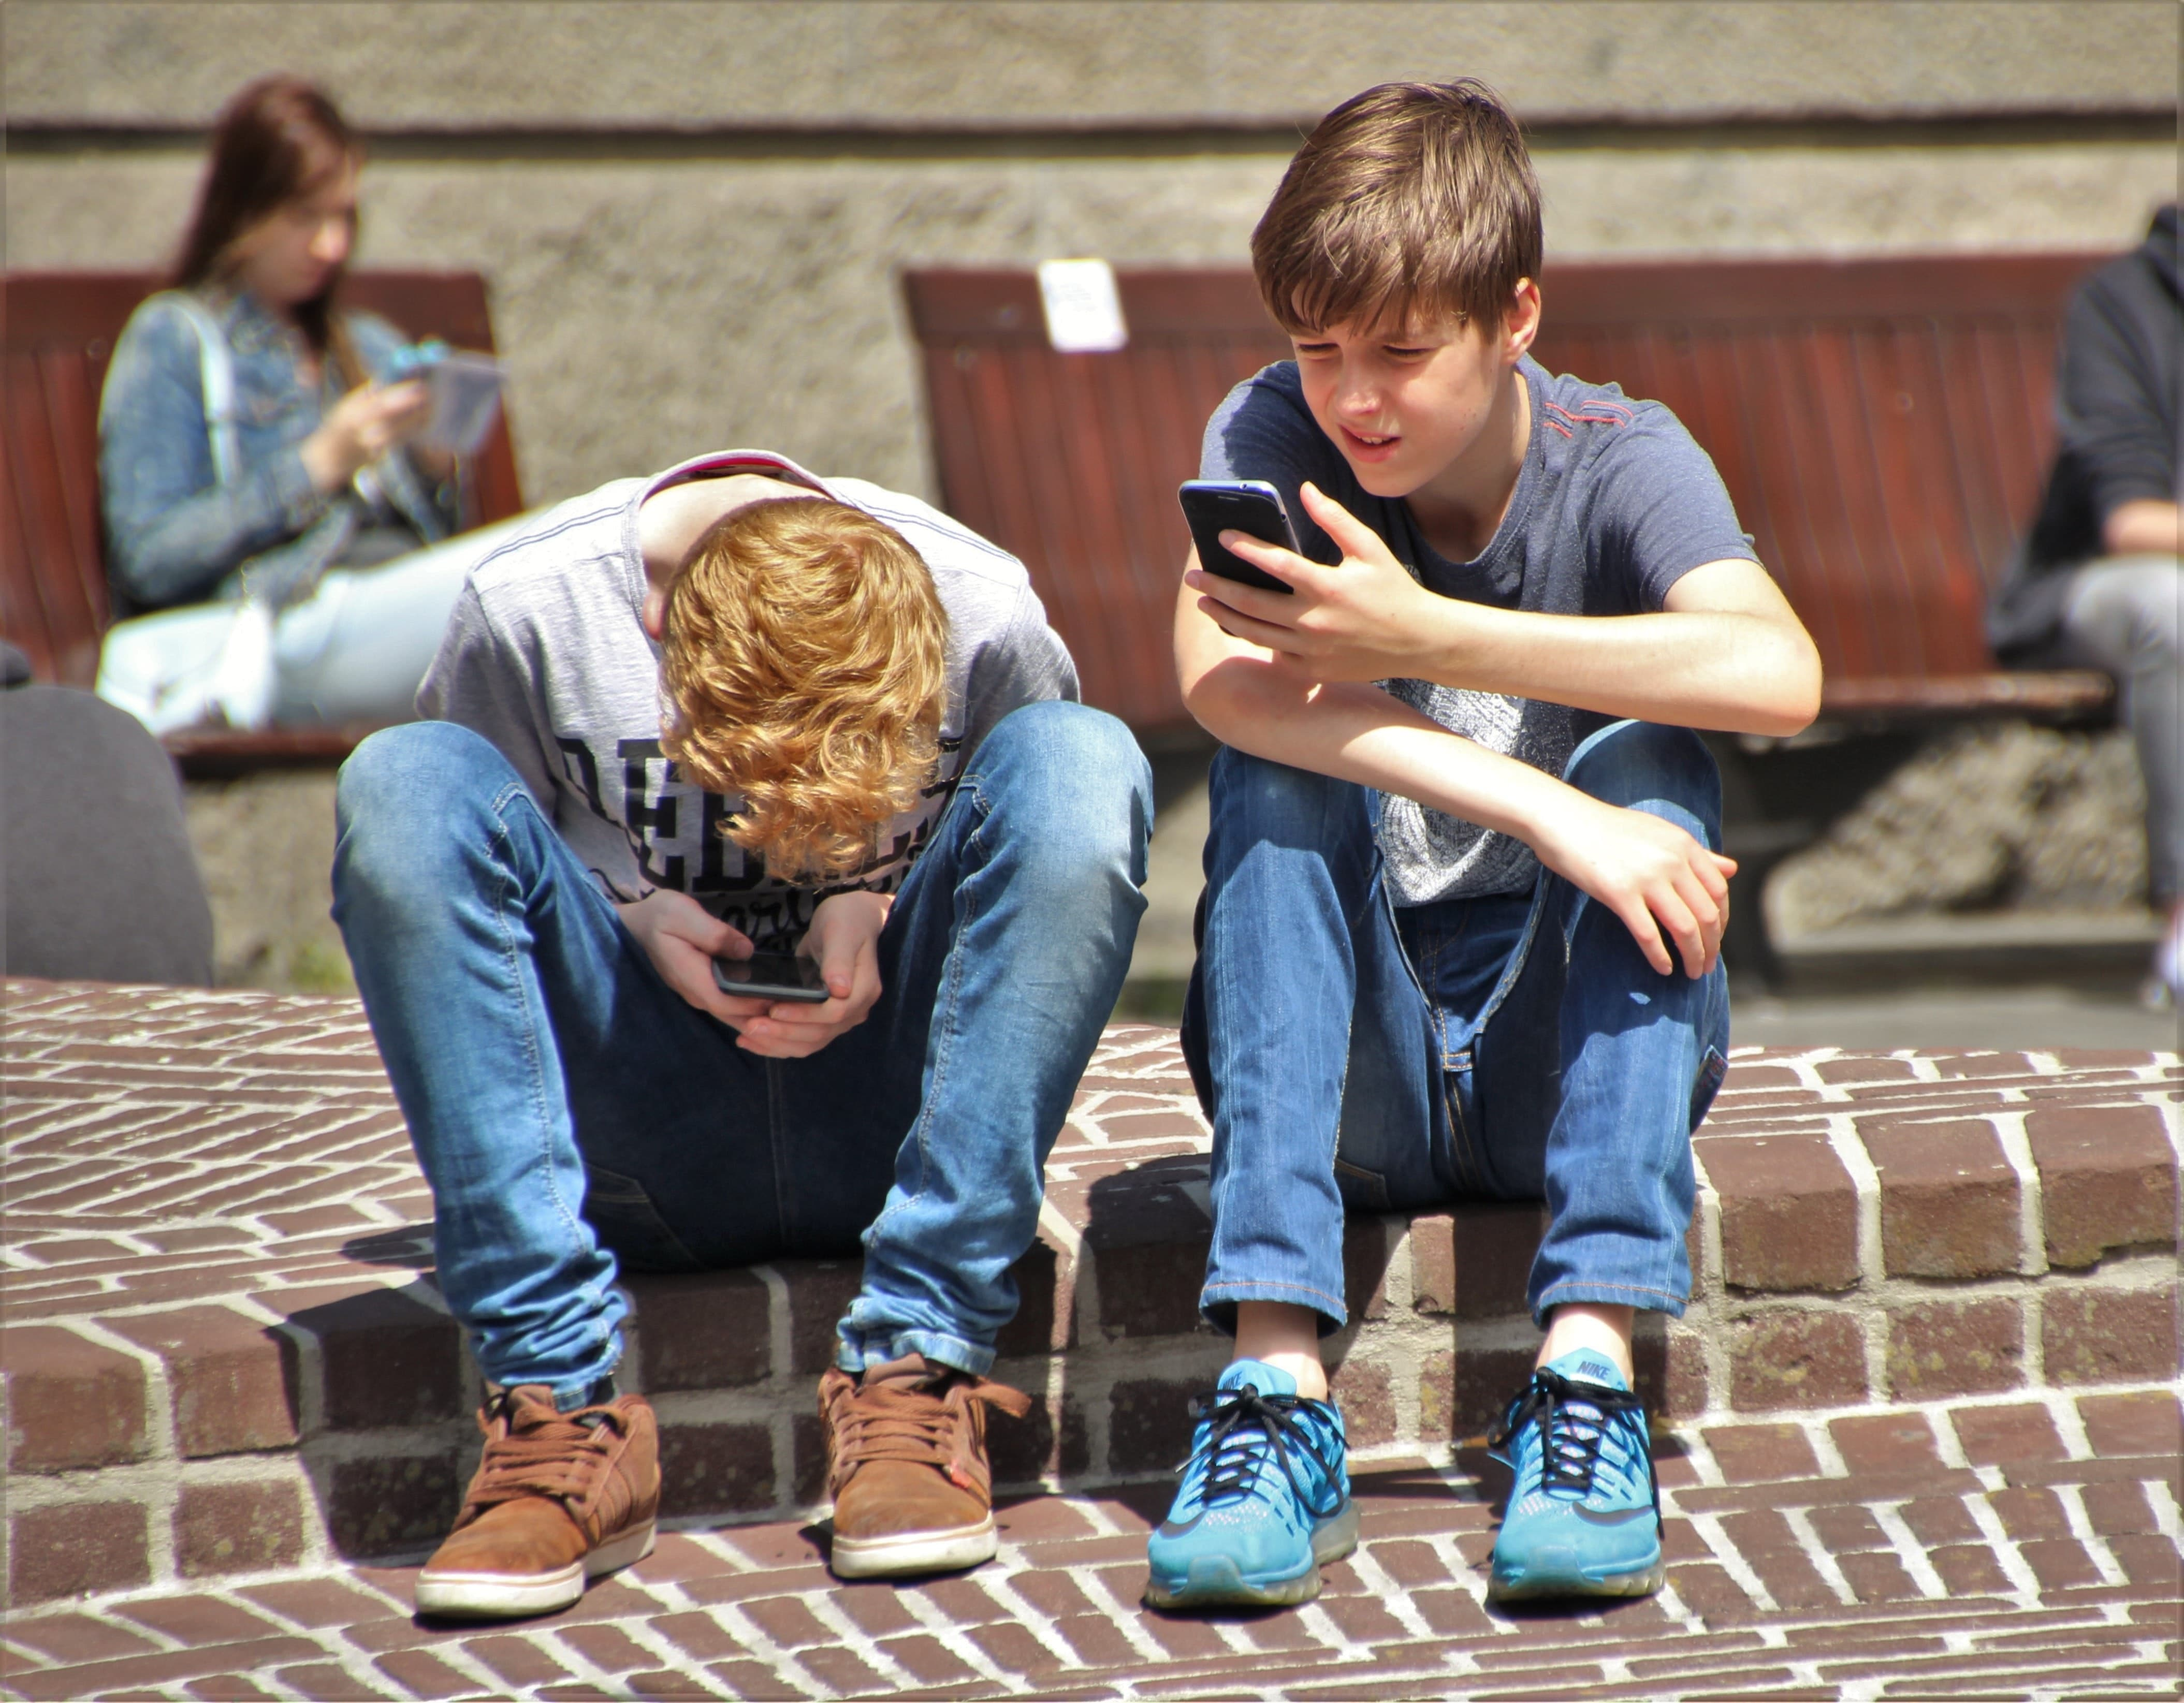 Kindererziehung mit HomeKit: Smartphone-Nutzung in den Griff bekommen